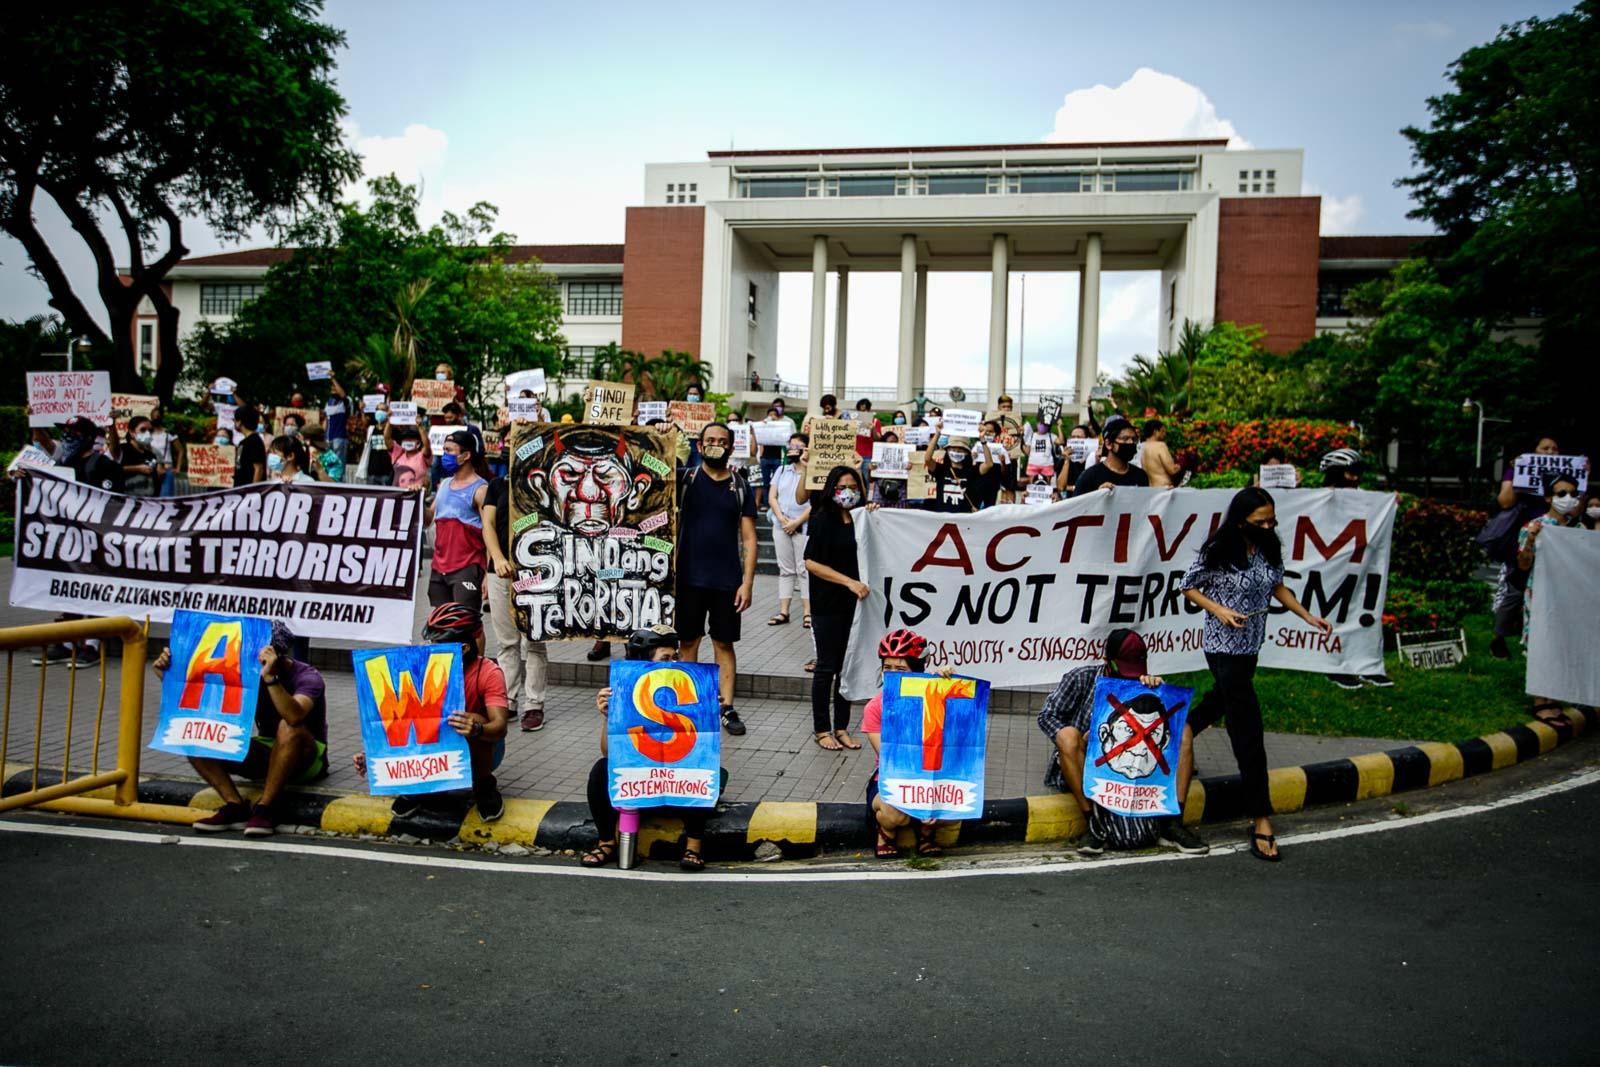 U.N. report raises concern over 'problematic' PH anti-terror bill